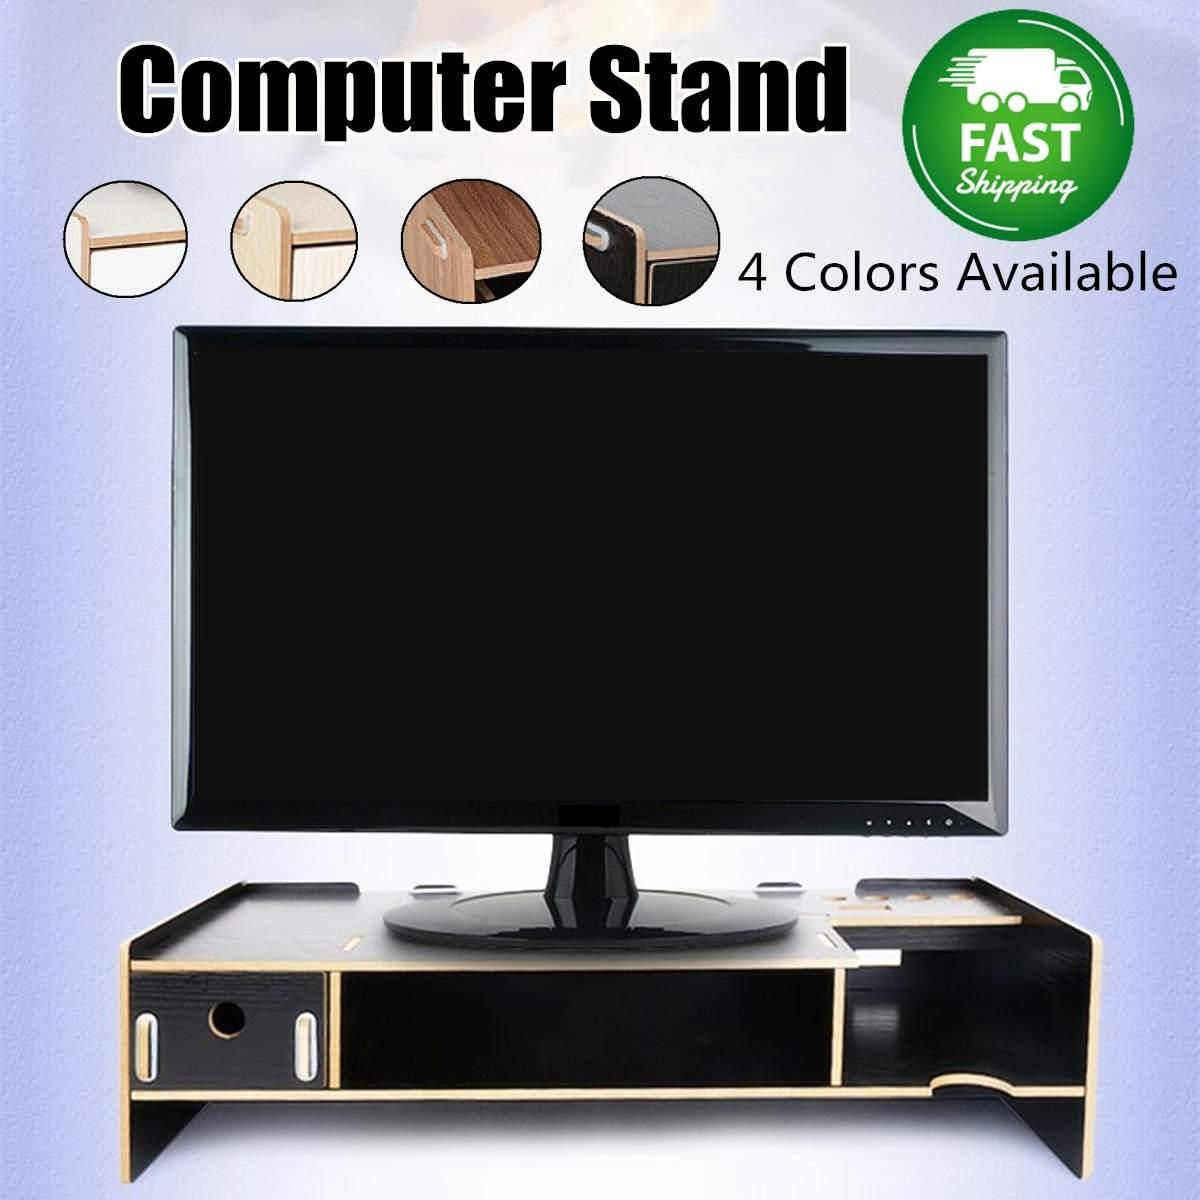 Desktop Monitor Stand Computer Screen Riser Wooden Shelf Plinth Strong Laptop Stand Desk Holder For Notebook TV Multifunction